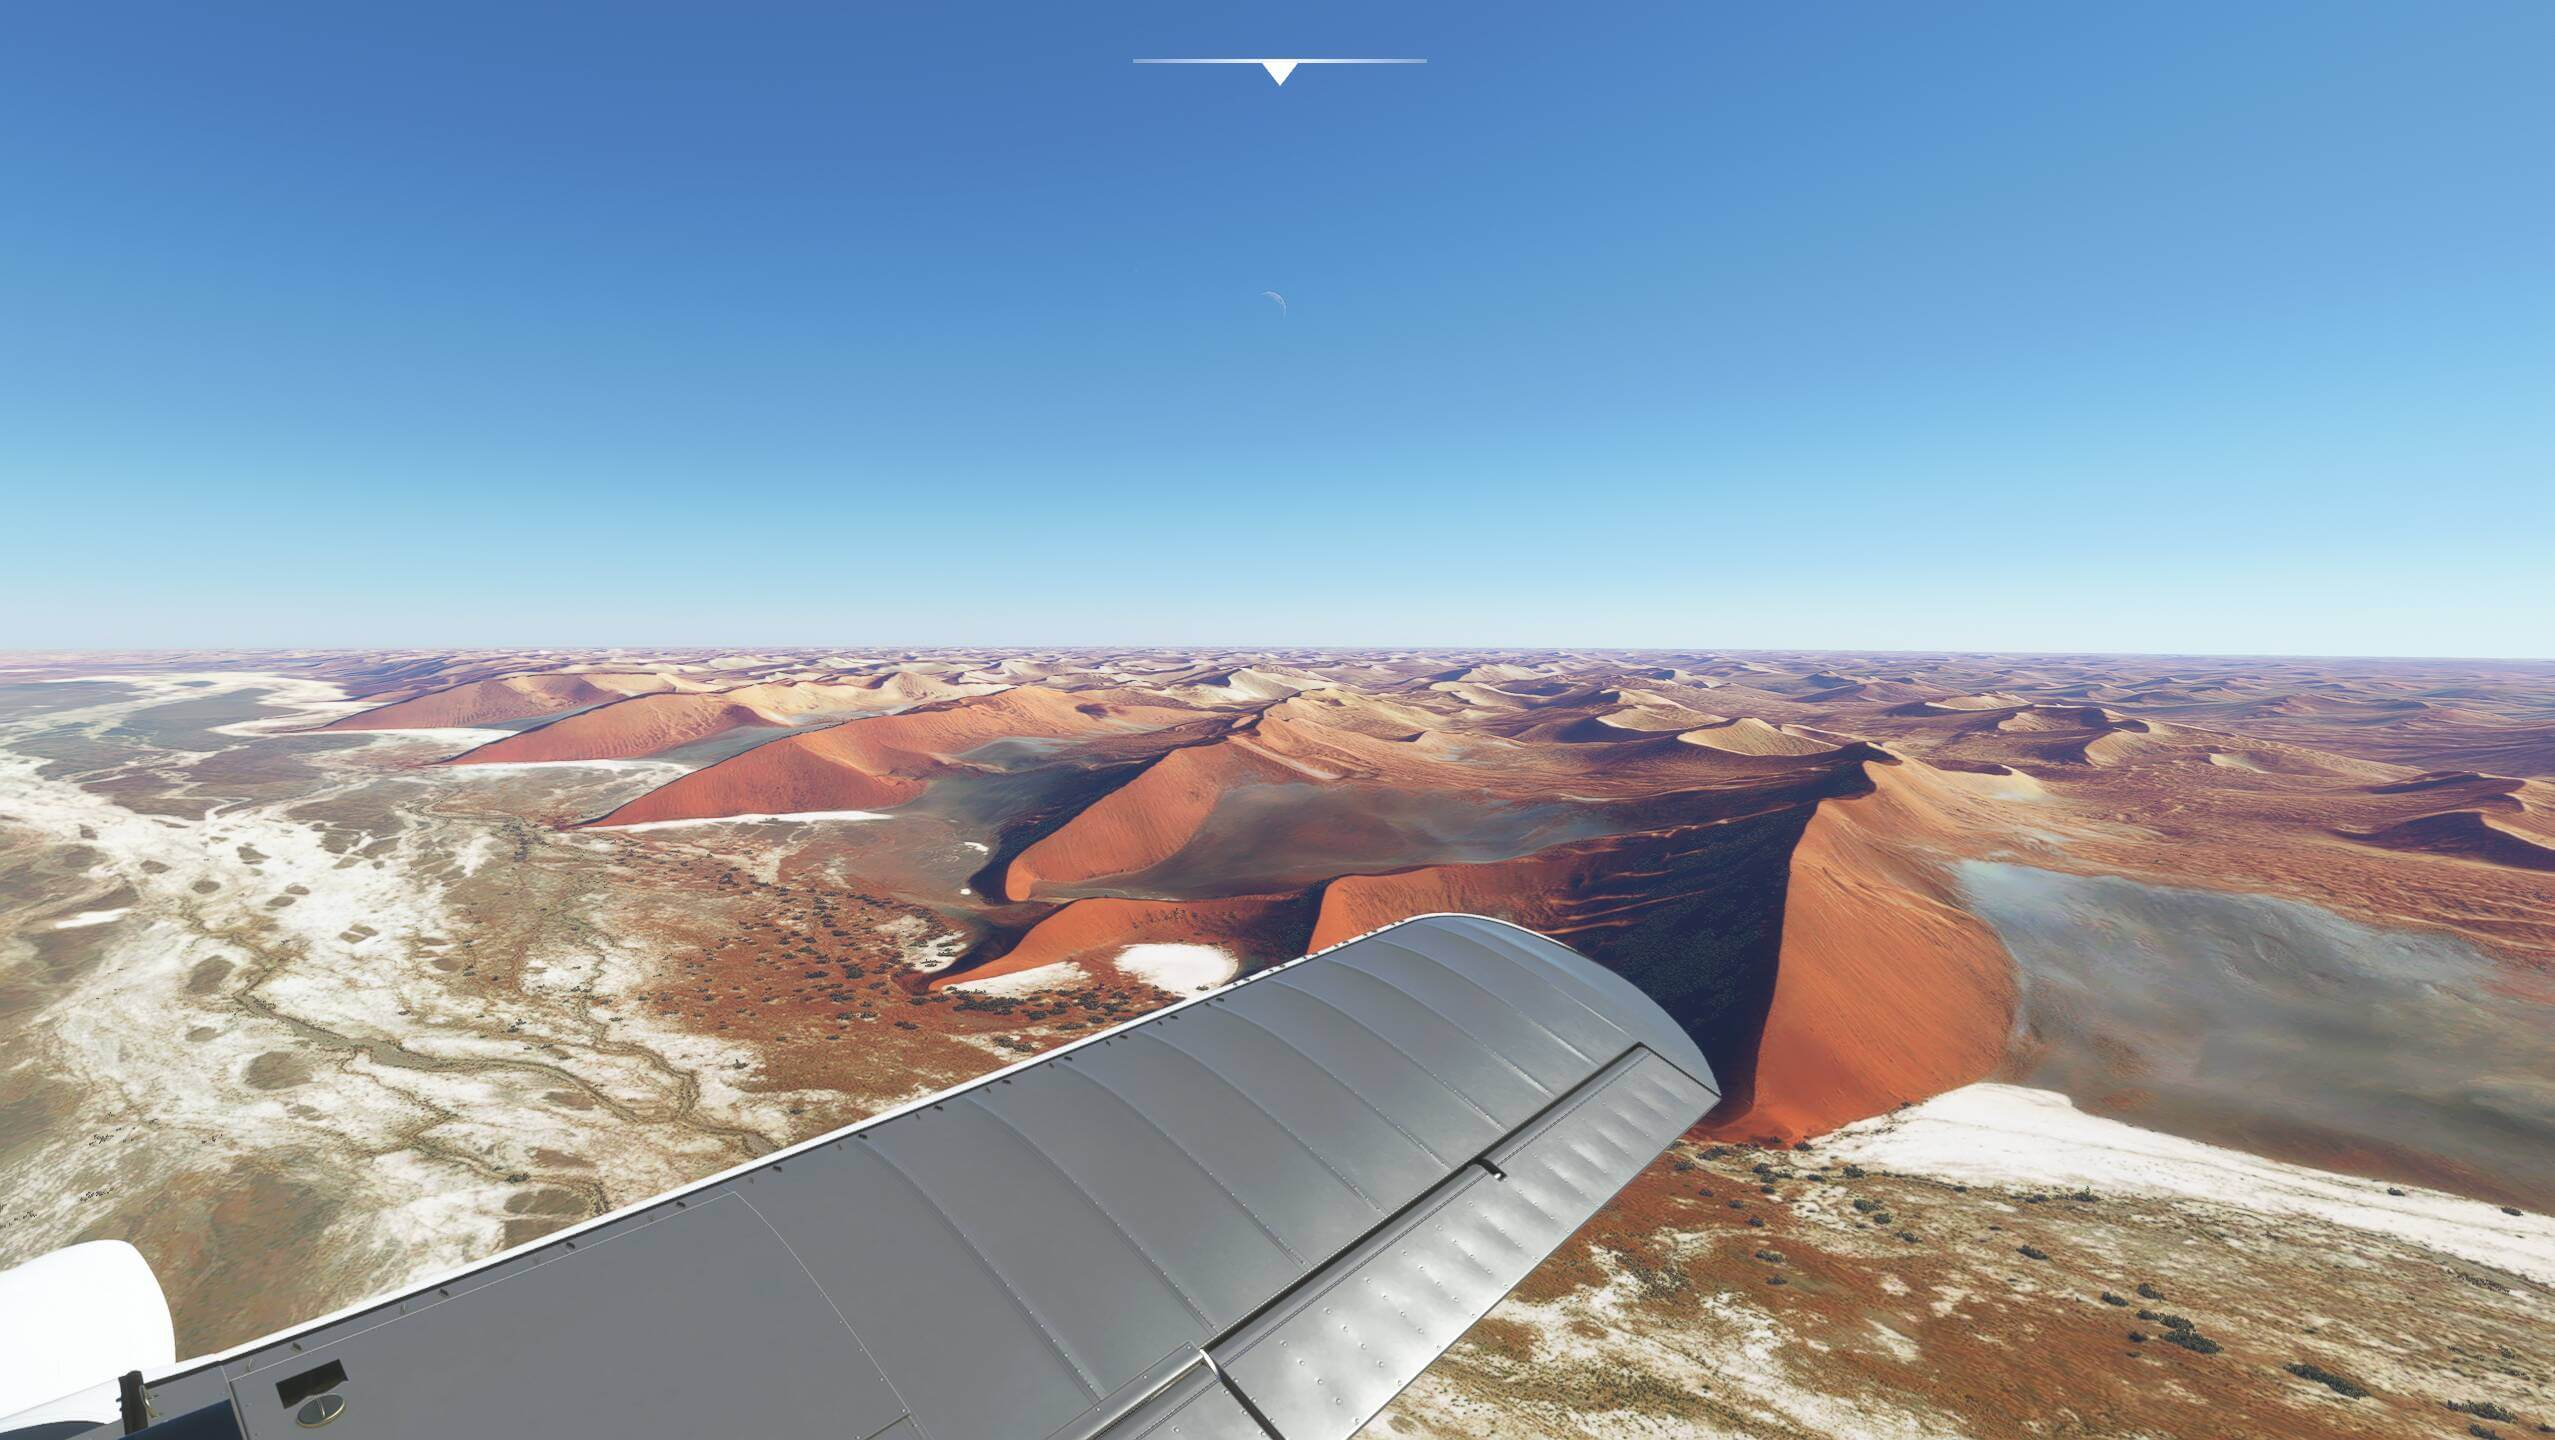 Plane wing view over desert dunes